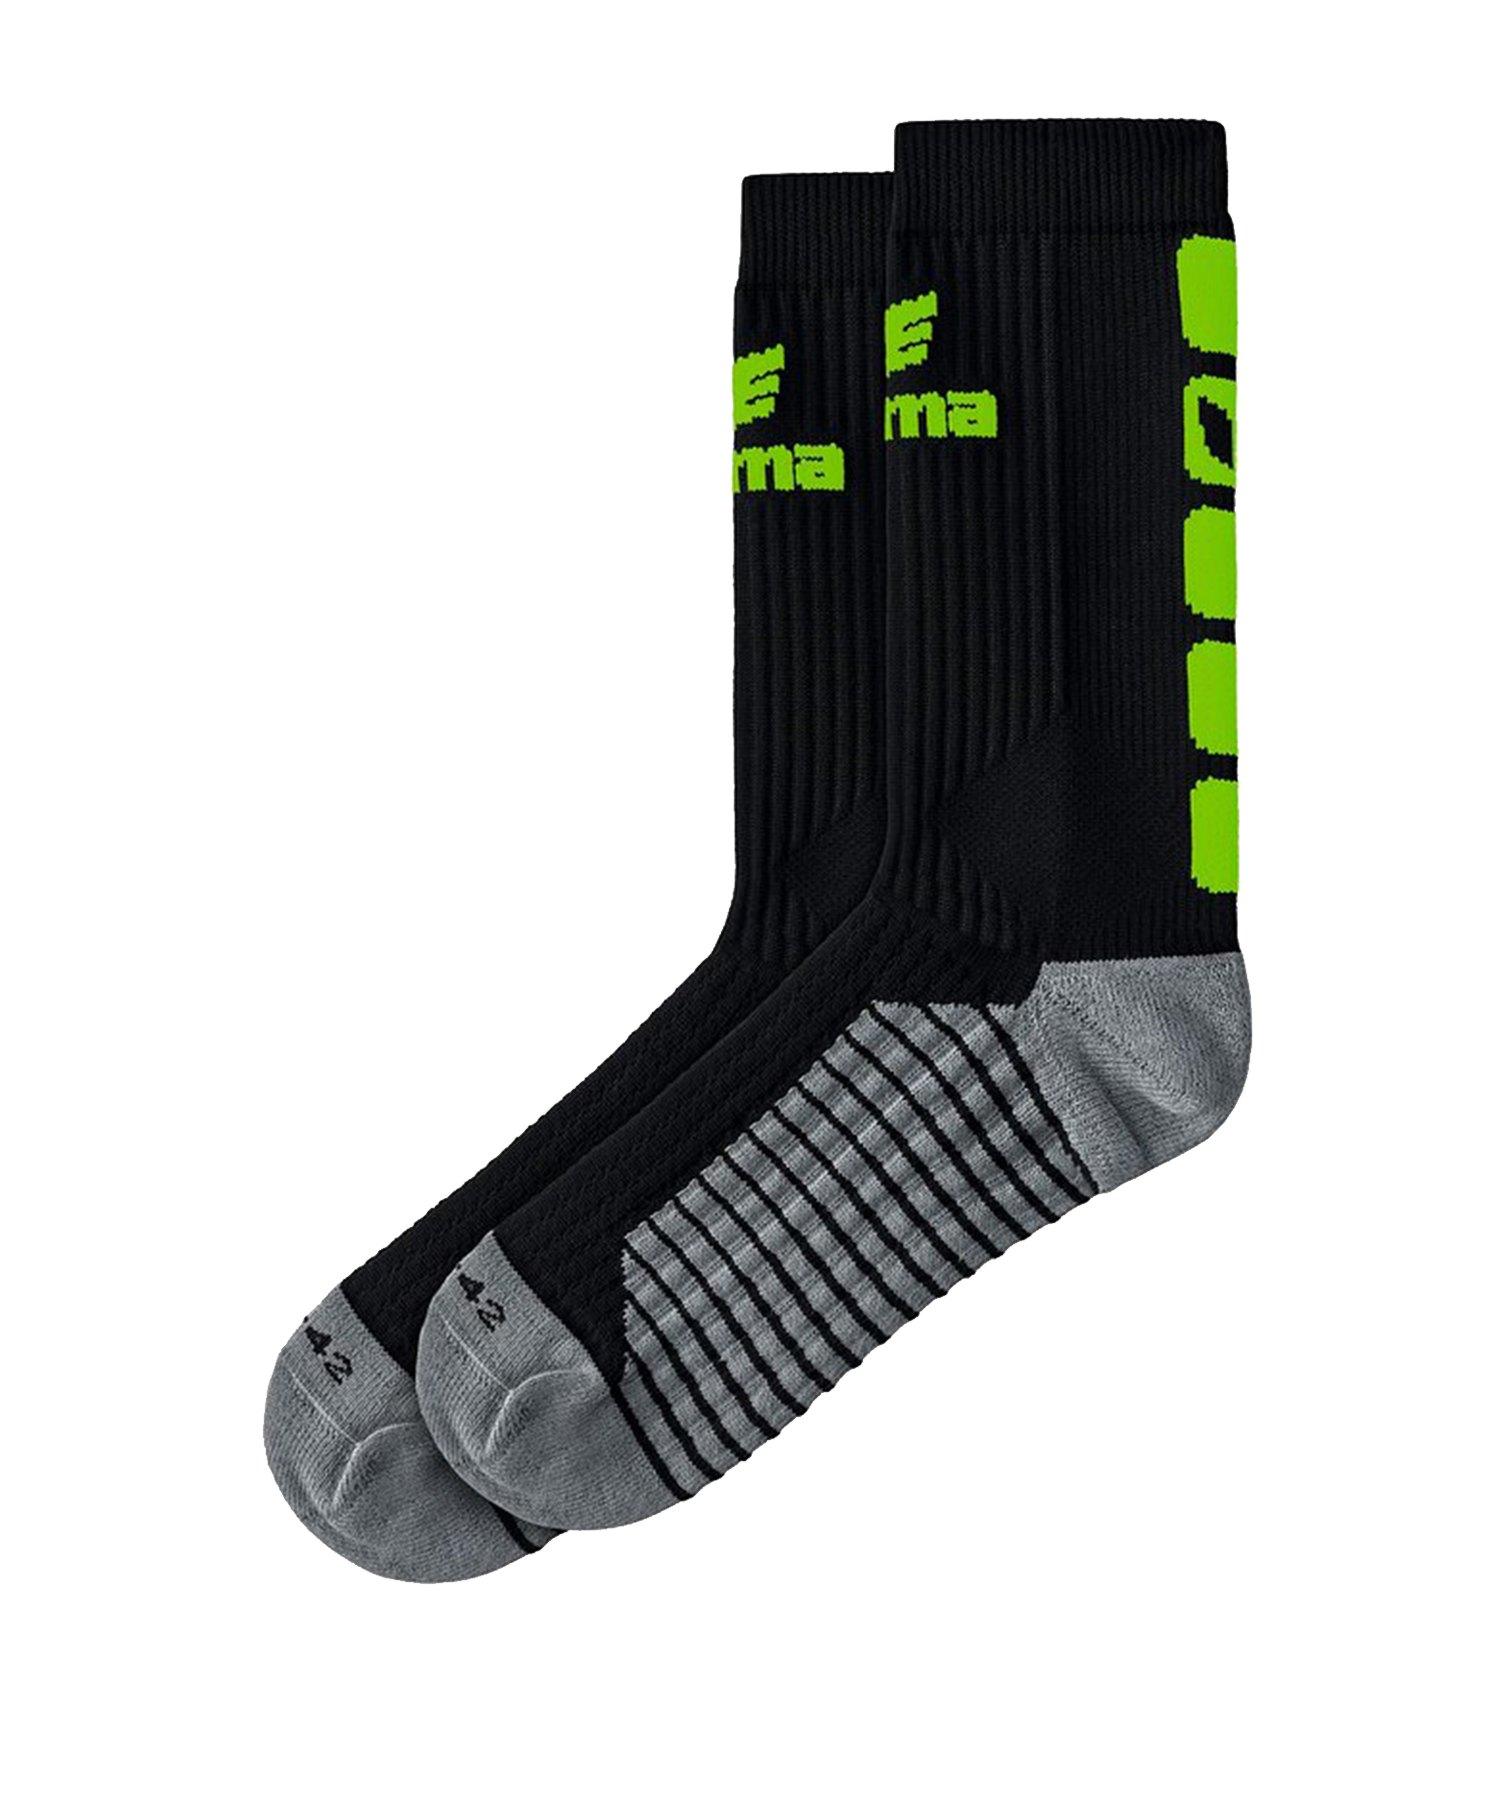 Erima CLASSIC 5-C Socken Schwarz Grün - Schwarz